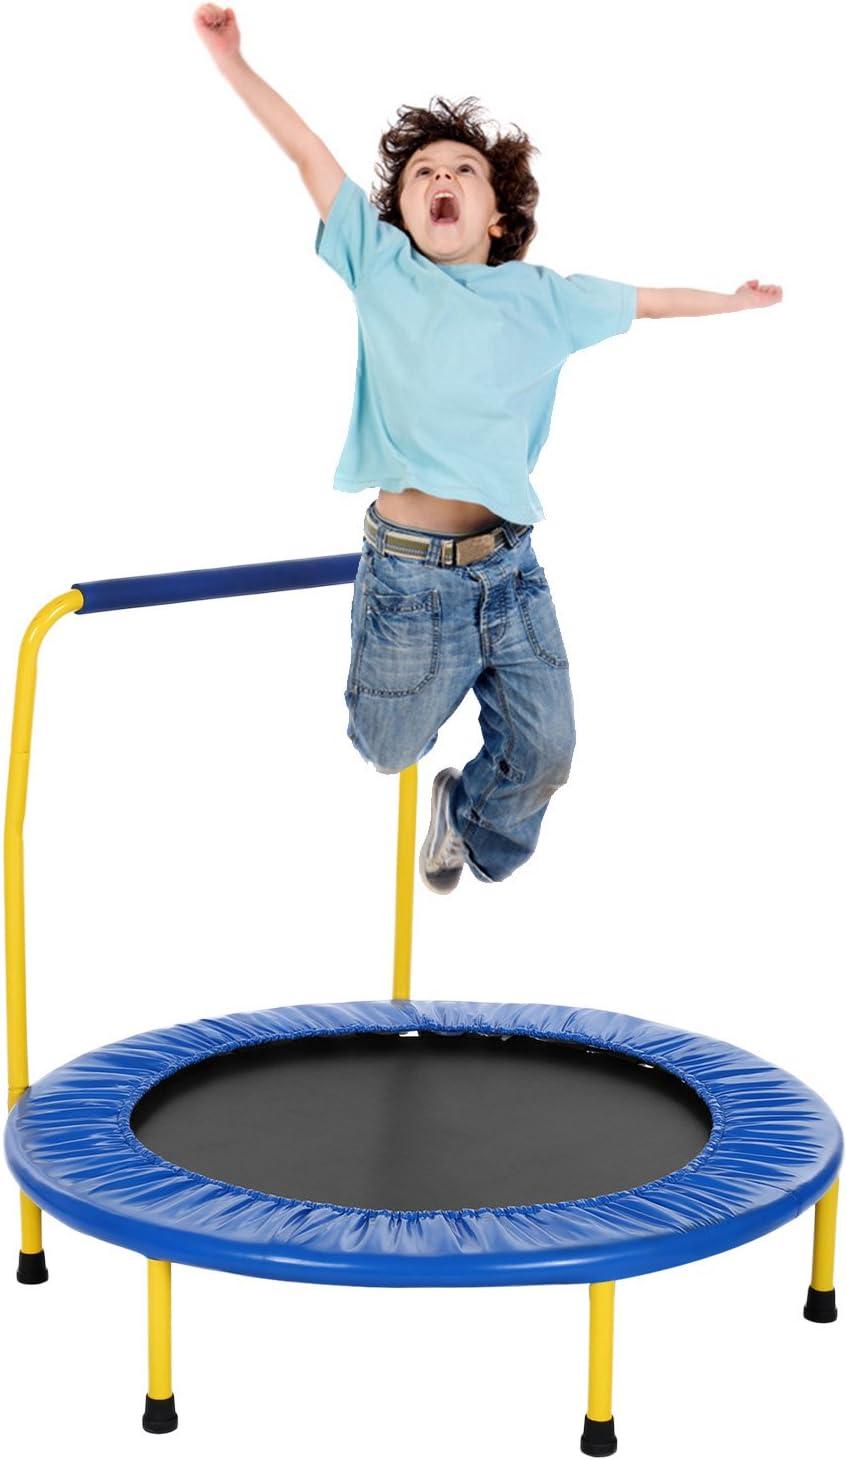 Fioleken Mini Rebounder Trampoline for Kids 36 inch Foldable with Adjustable Handle Indoor Outdoor Use for Child Age 3